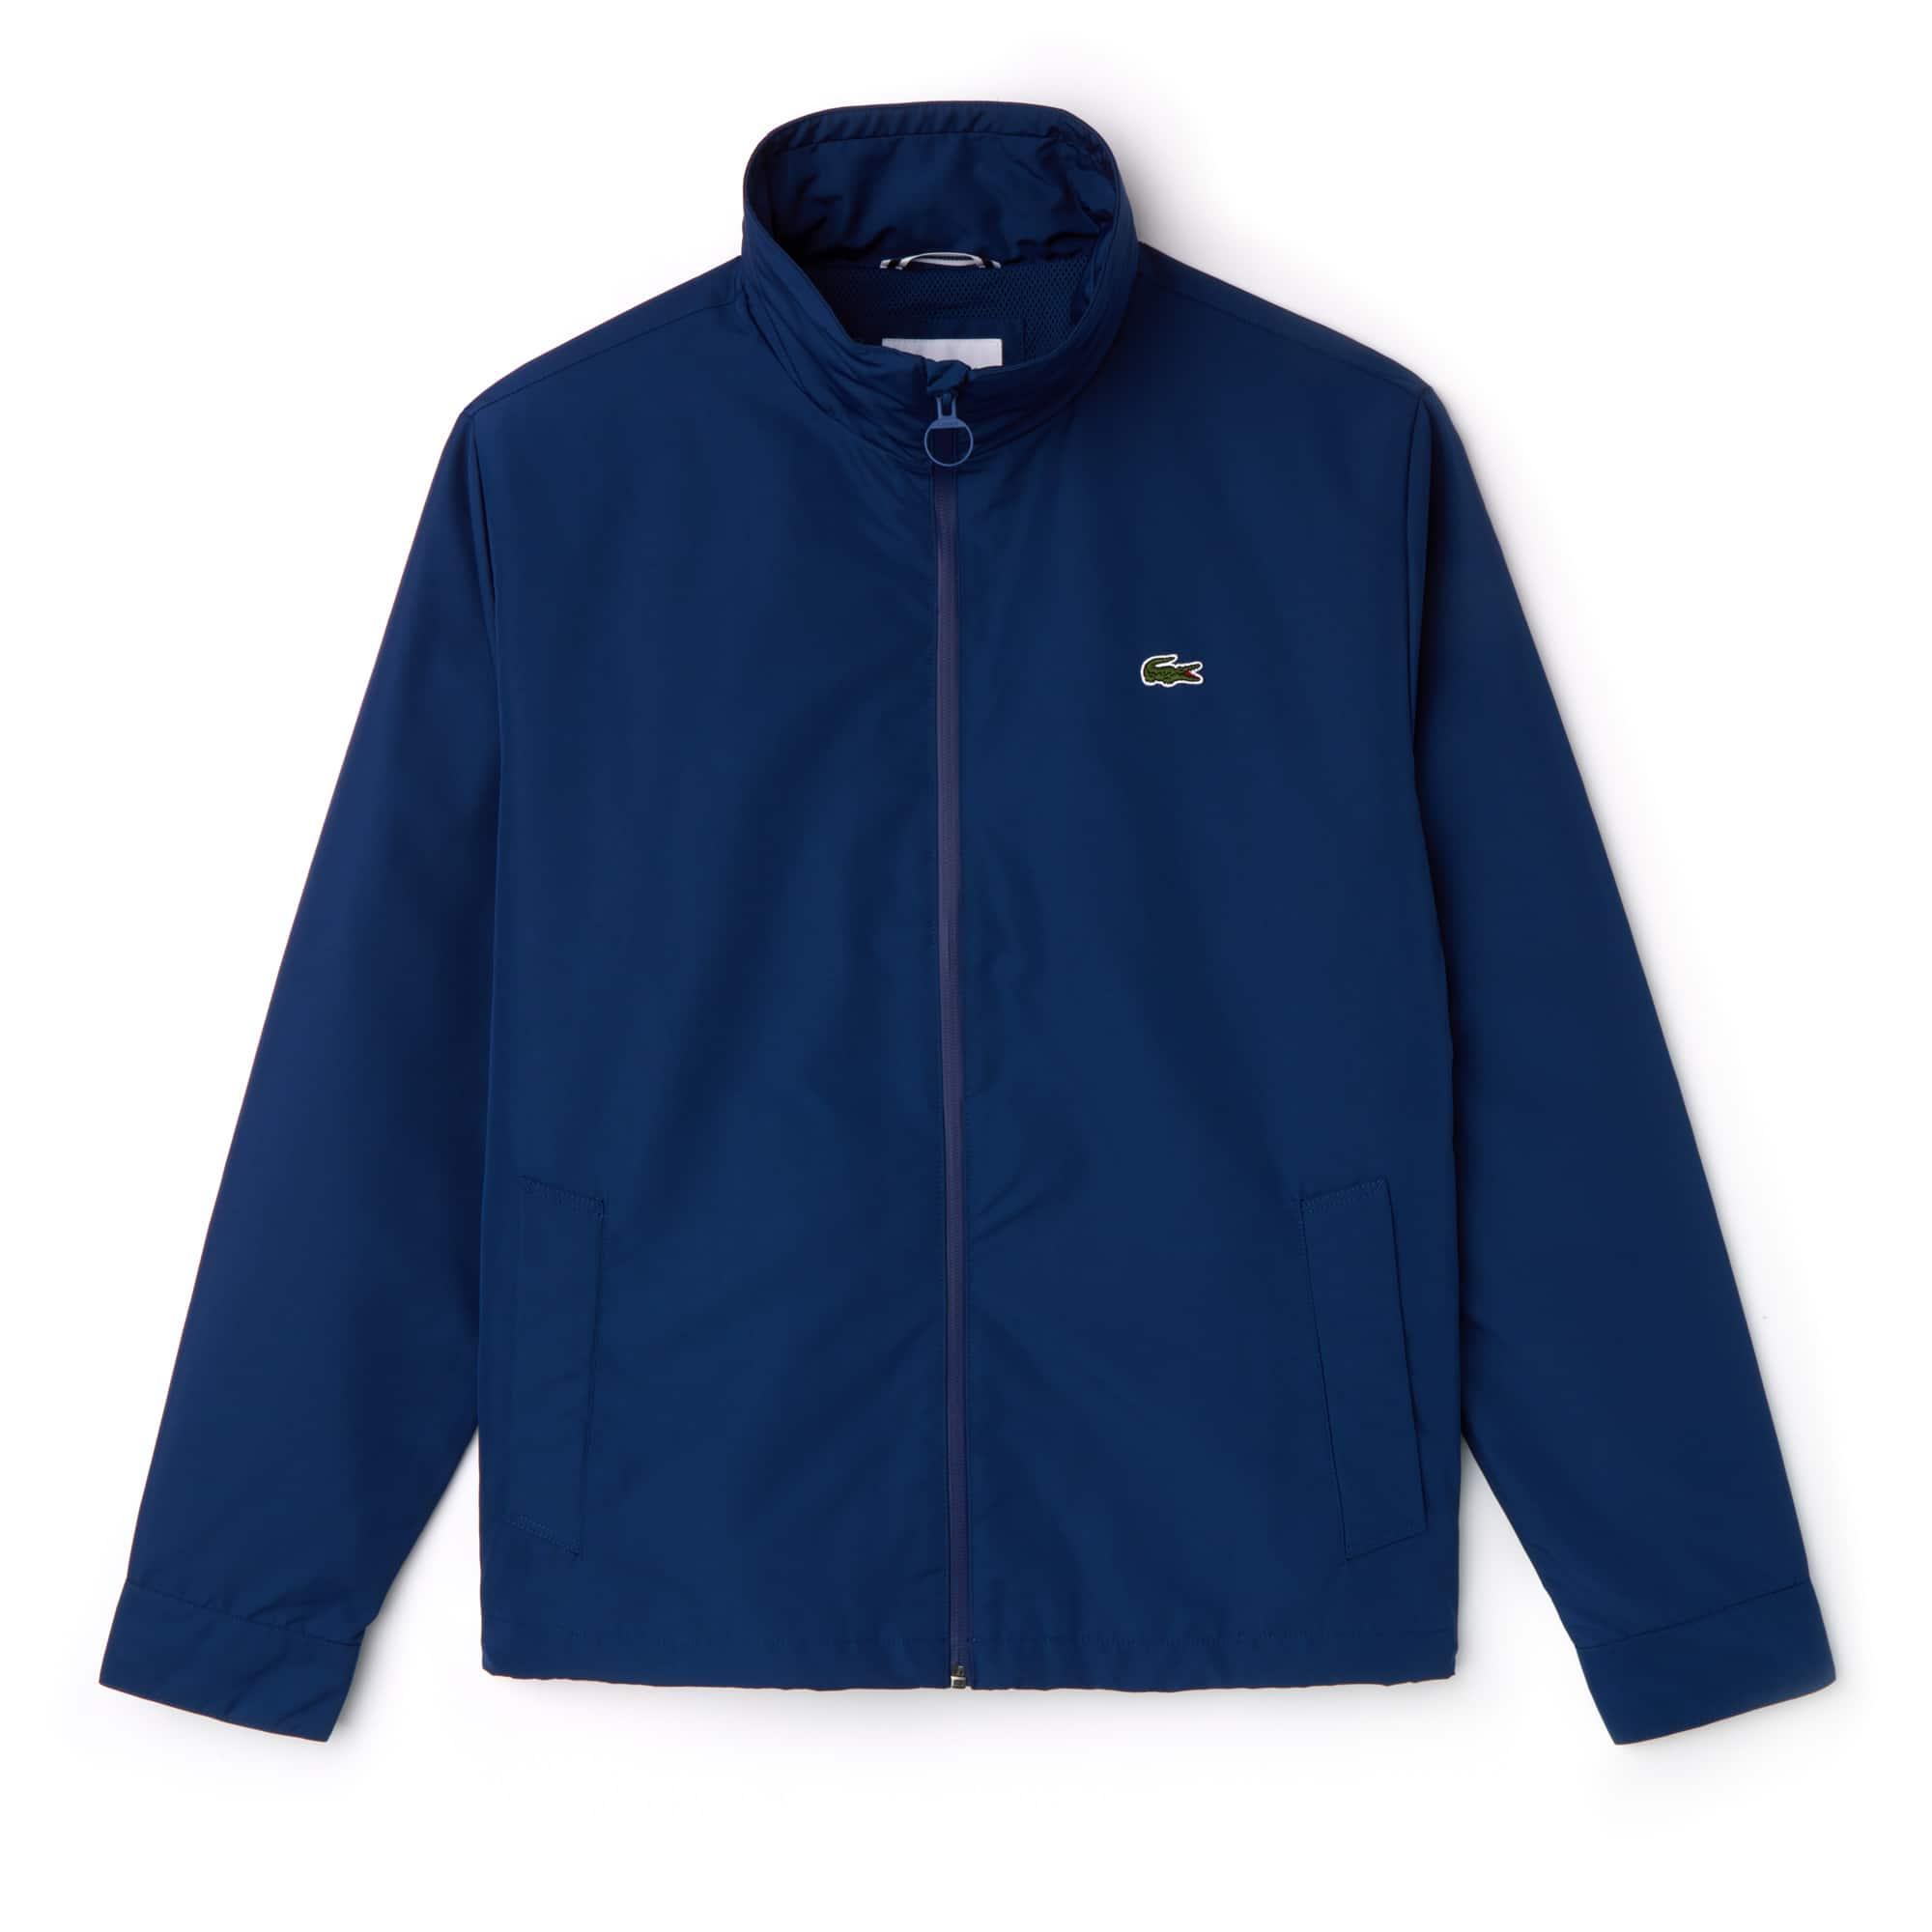 Men's Concealed Hood Zippered Lightweight Taffeta Jacket